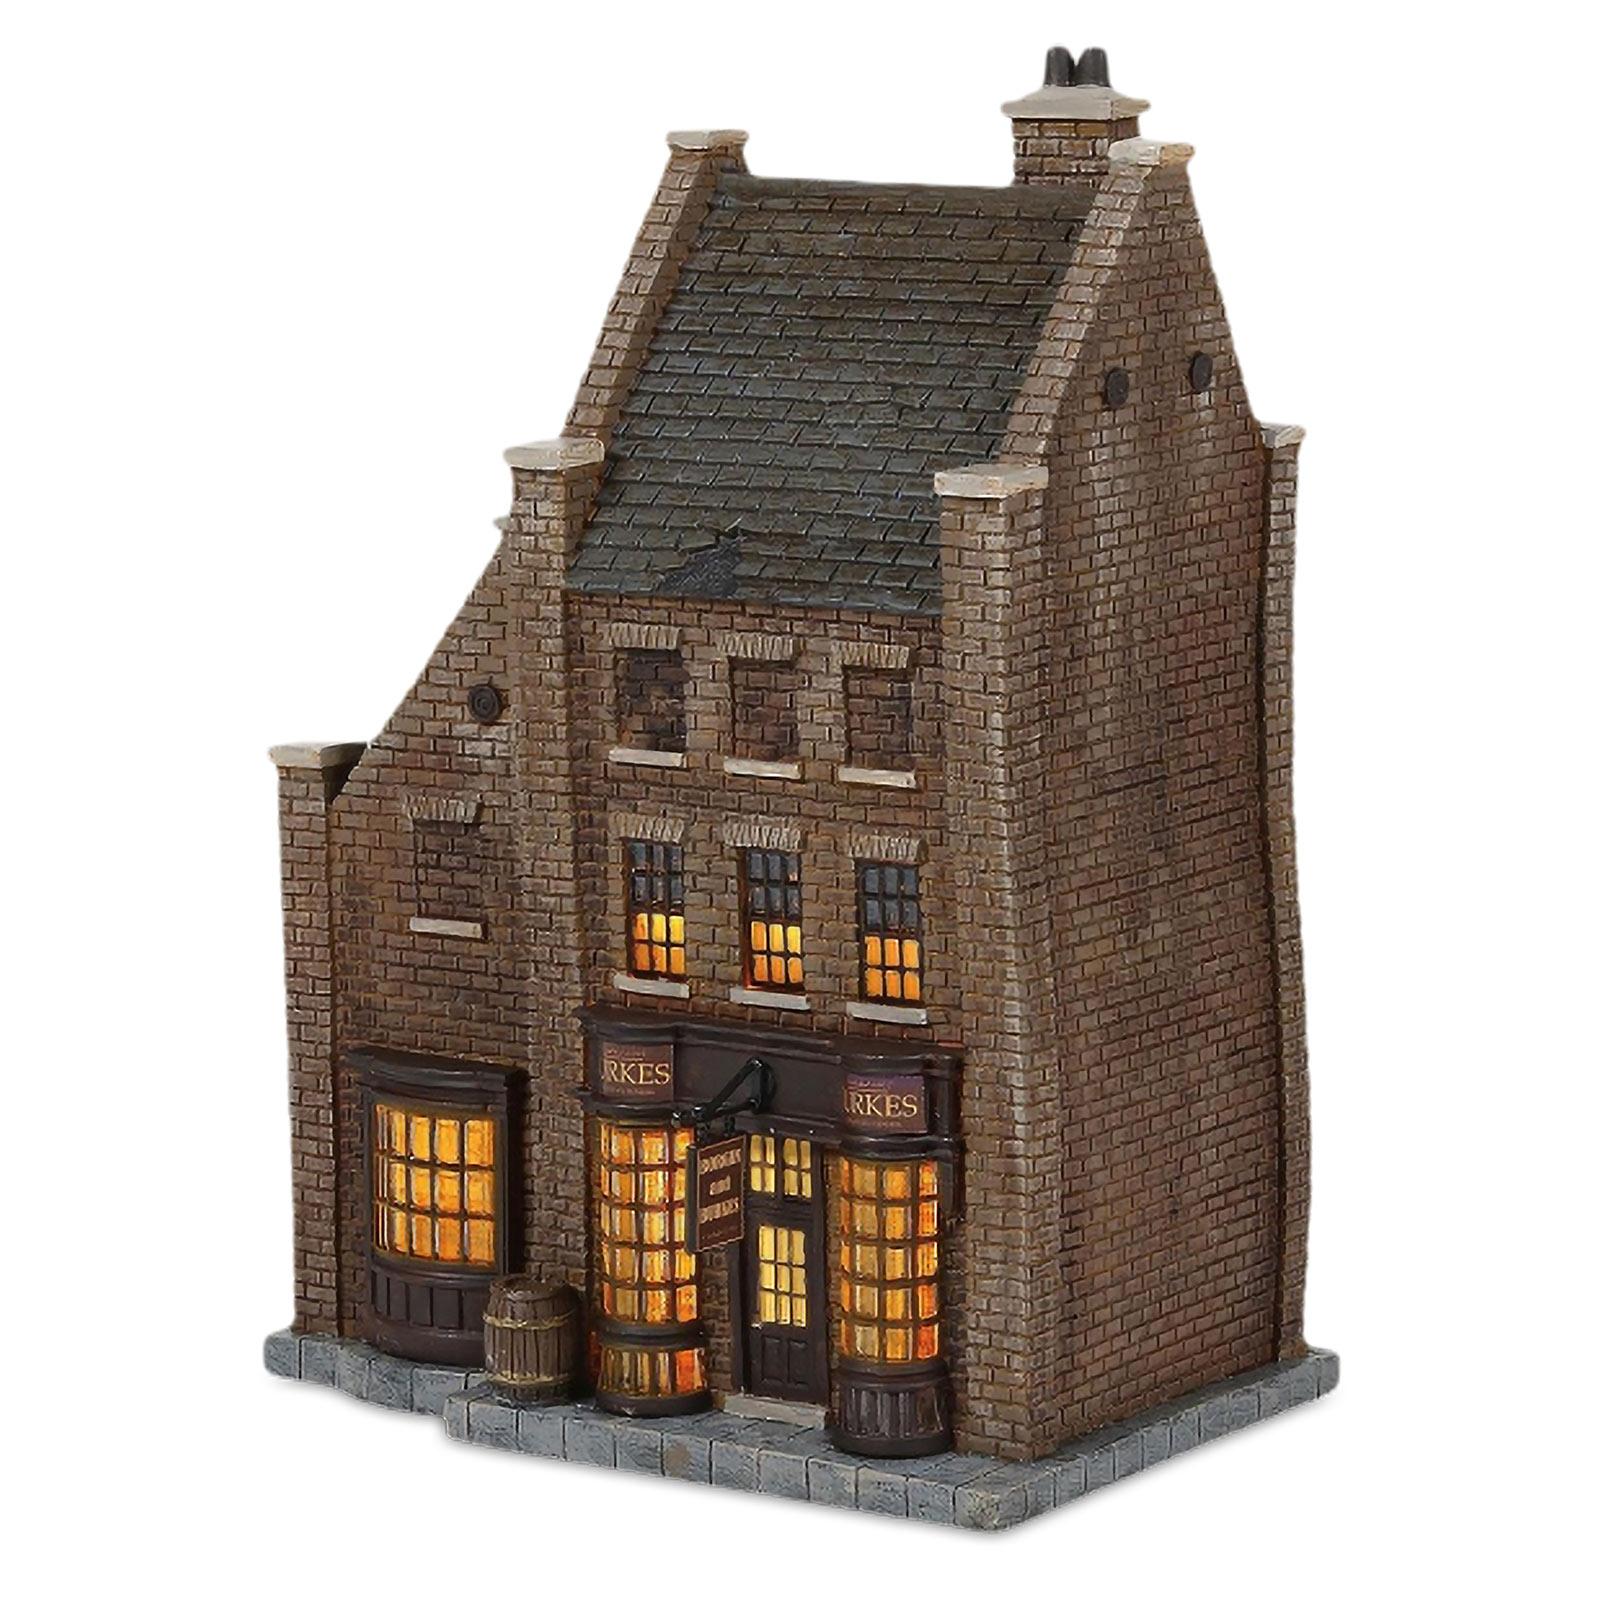 Borgin & Burkes Shop Miniatur Replik mit Beleuchtung - Harry Potter